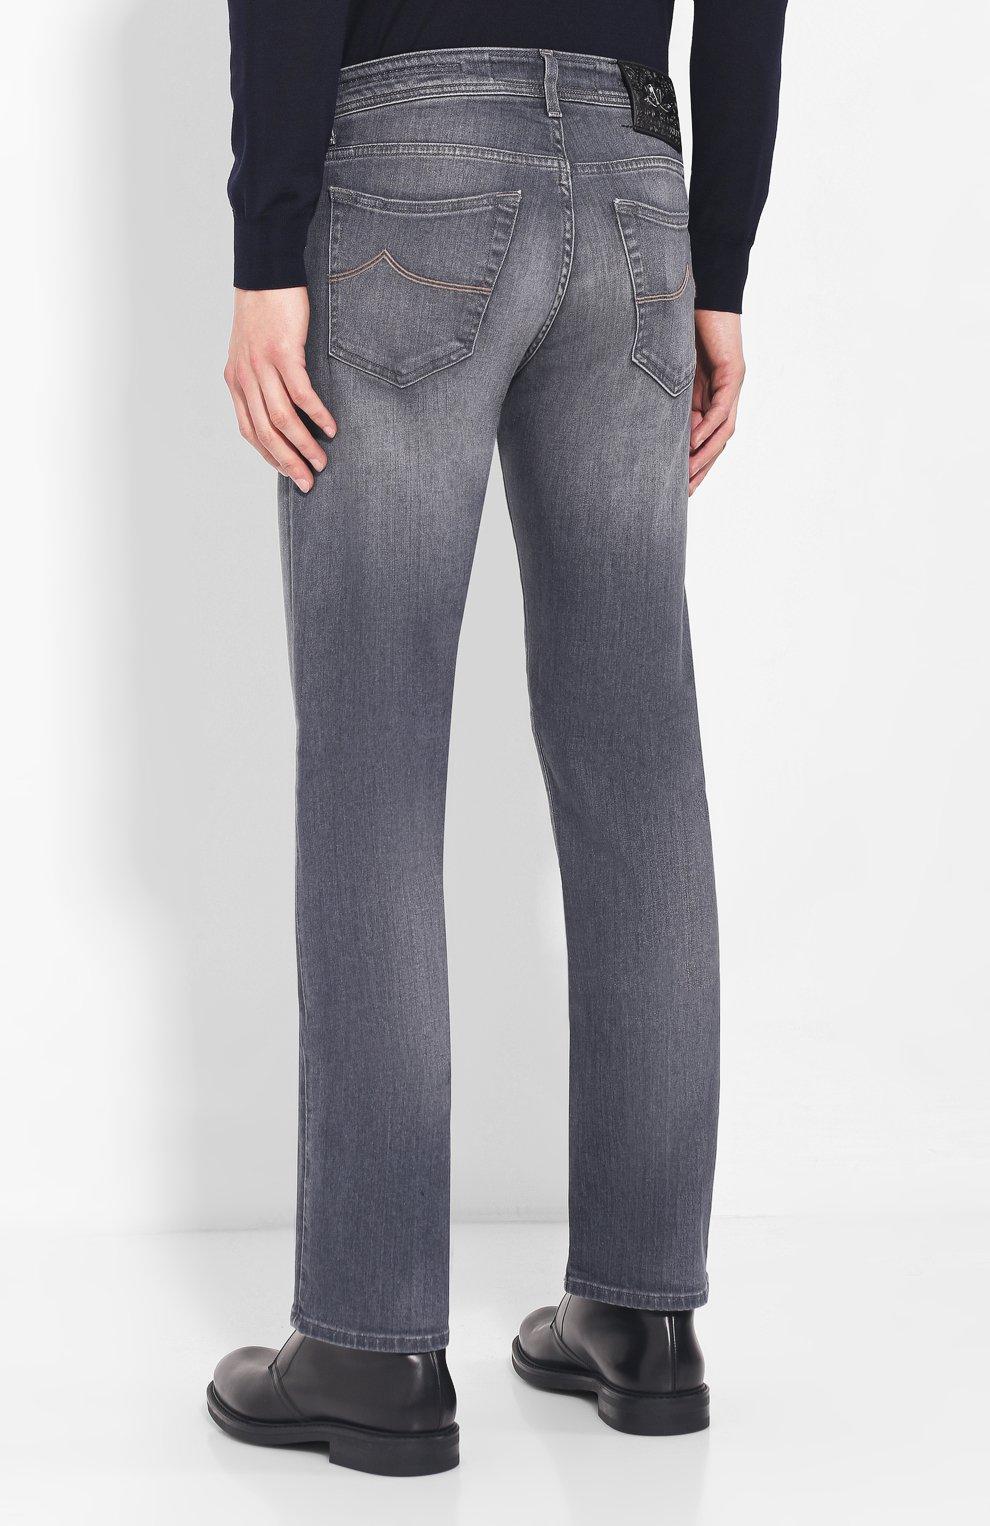 Мужские джинсы JACOB COHEN серого цвета, арт. J620 C0MF 01578-W2/52 | Фото 4